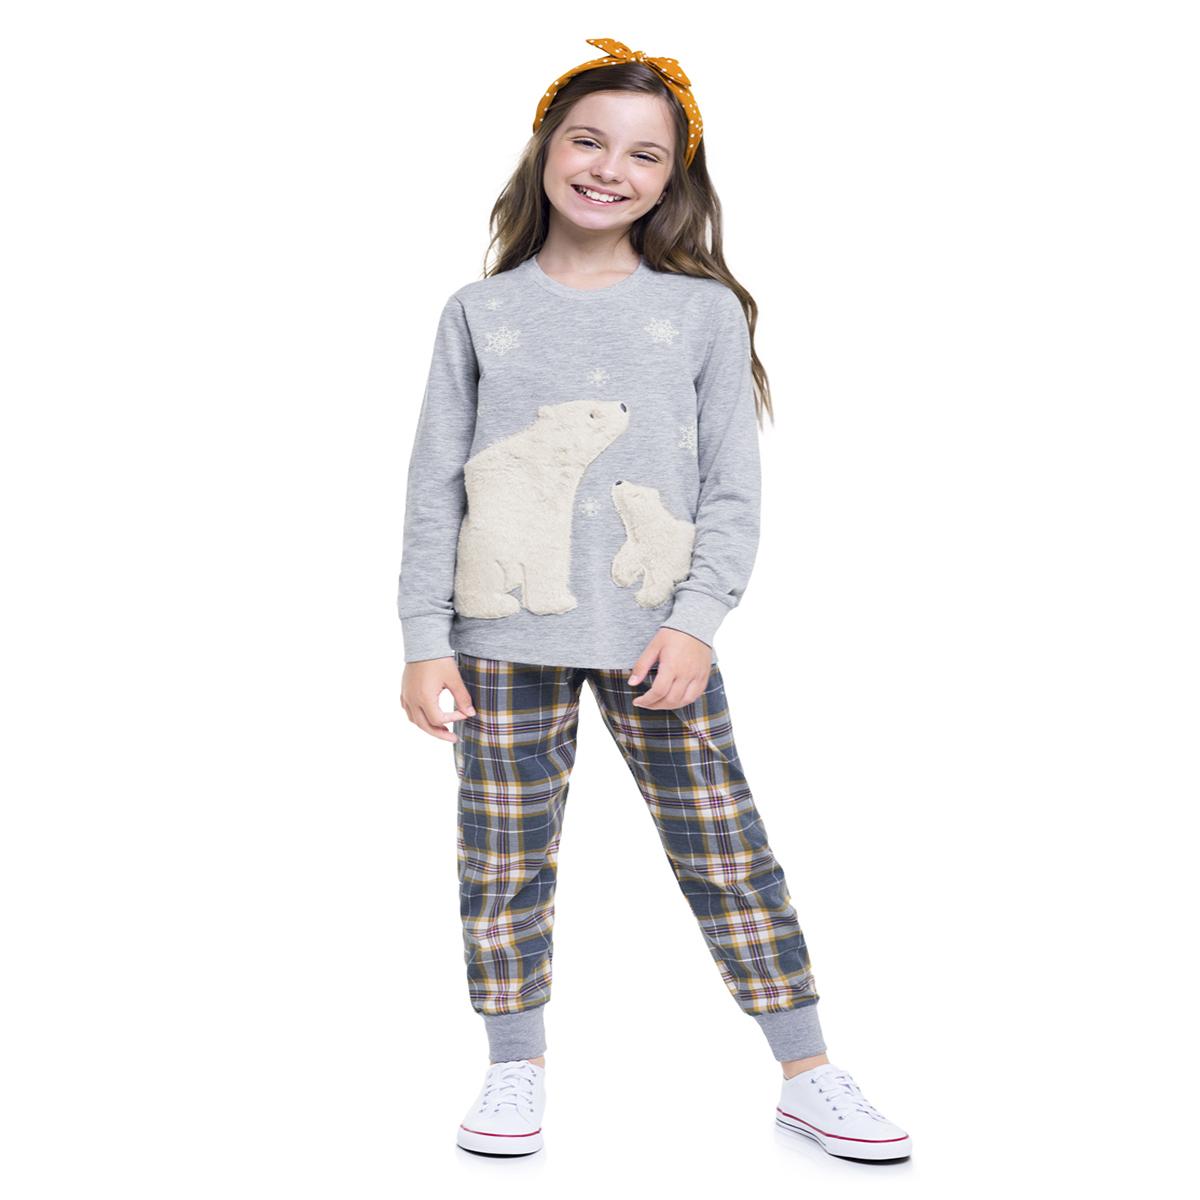 Pijama infantil menina xadrez inverno quentinho filha